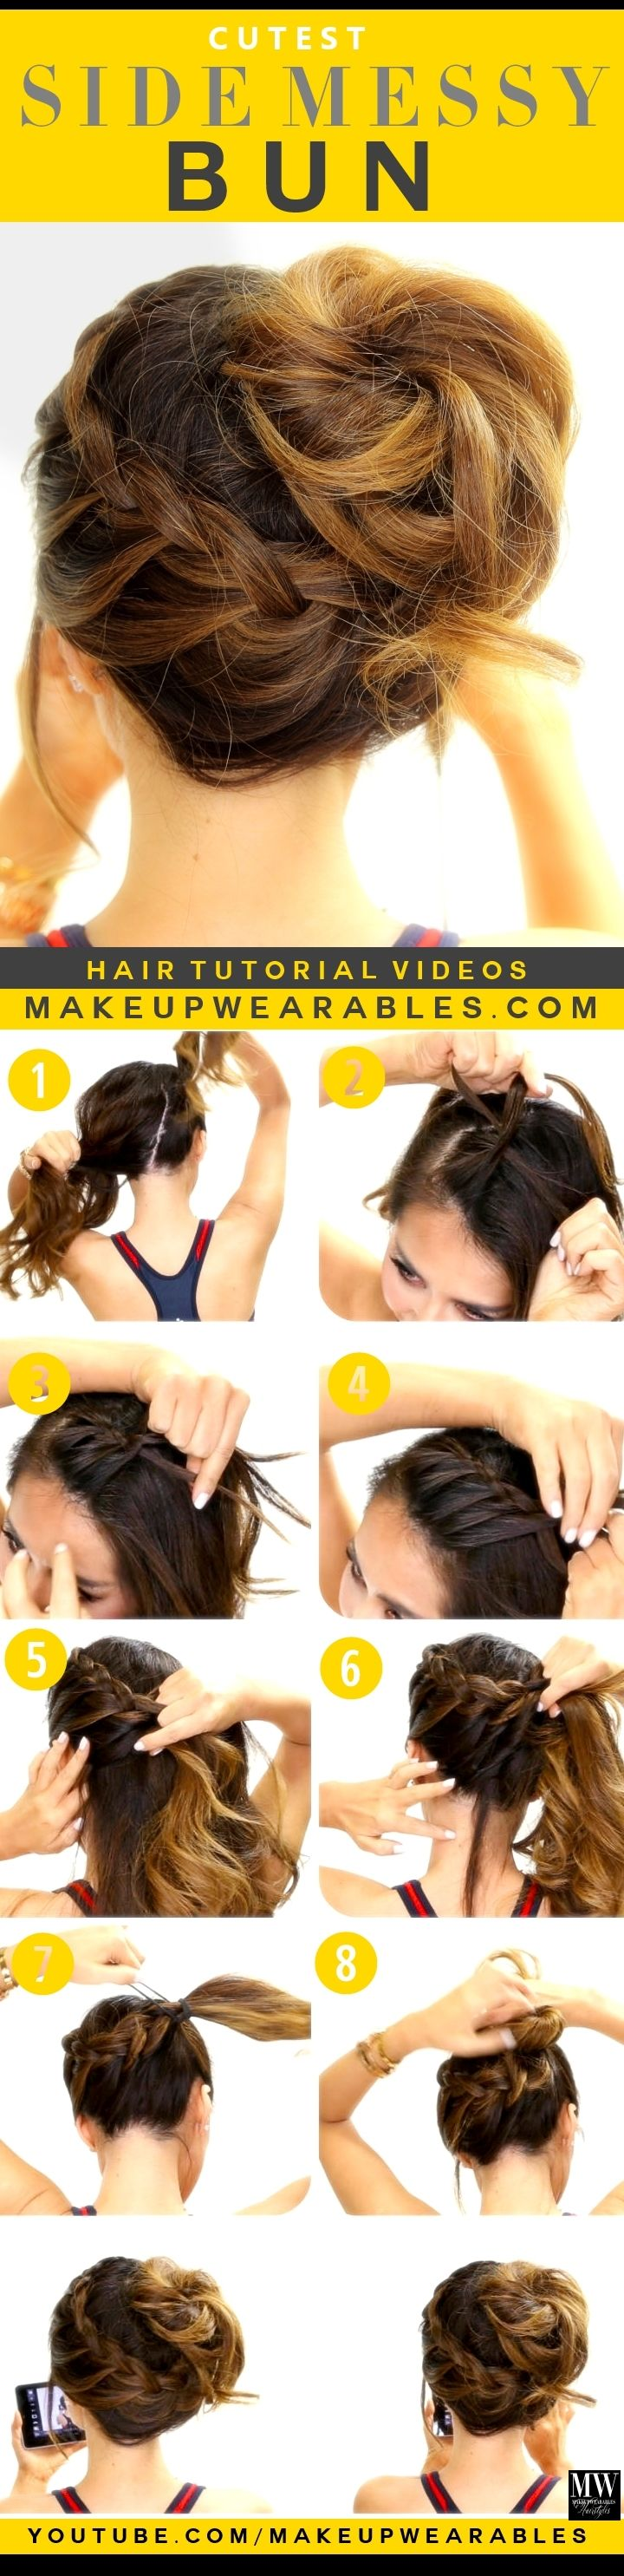 DIY Side Messy Bun diy long hair hair ideas diy ideas easy diy diy